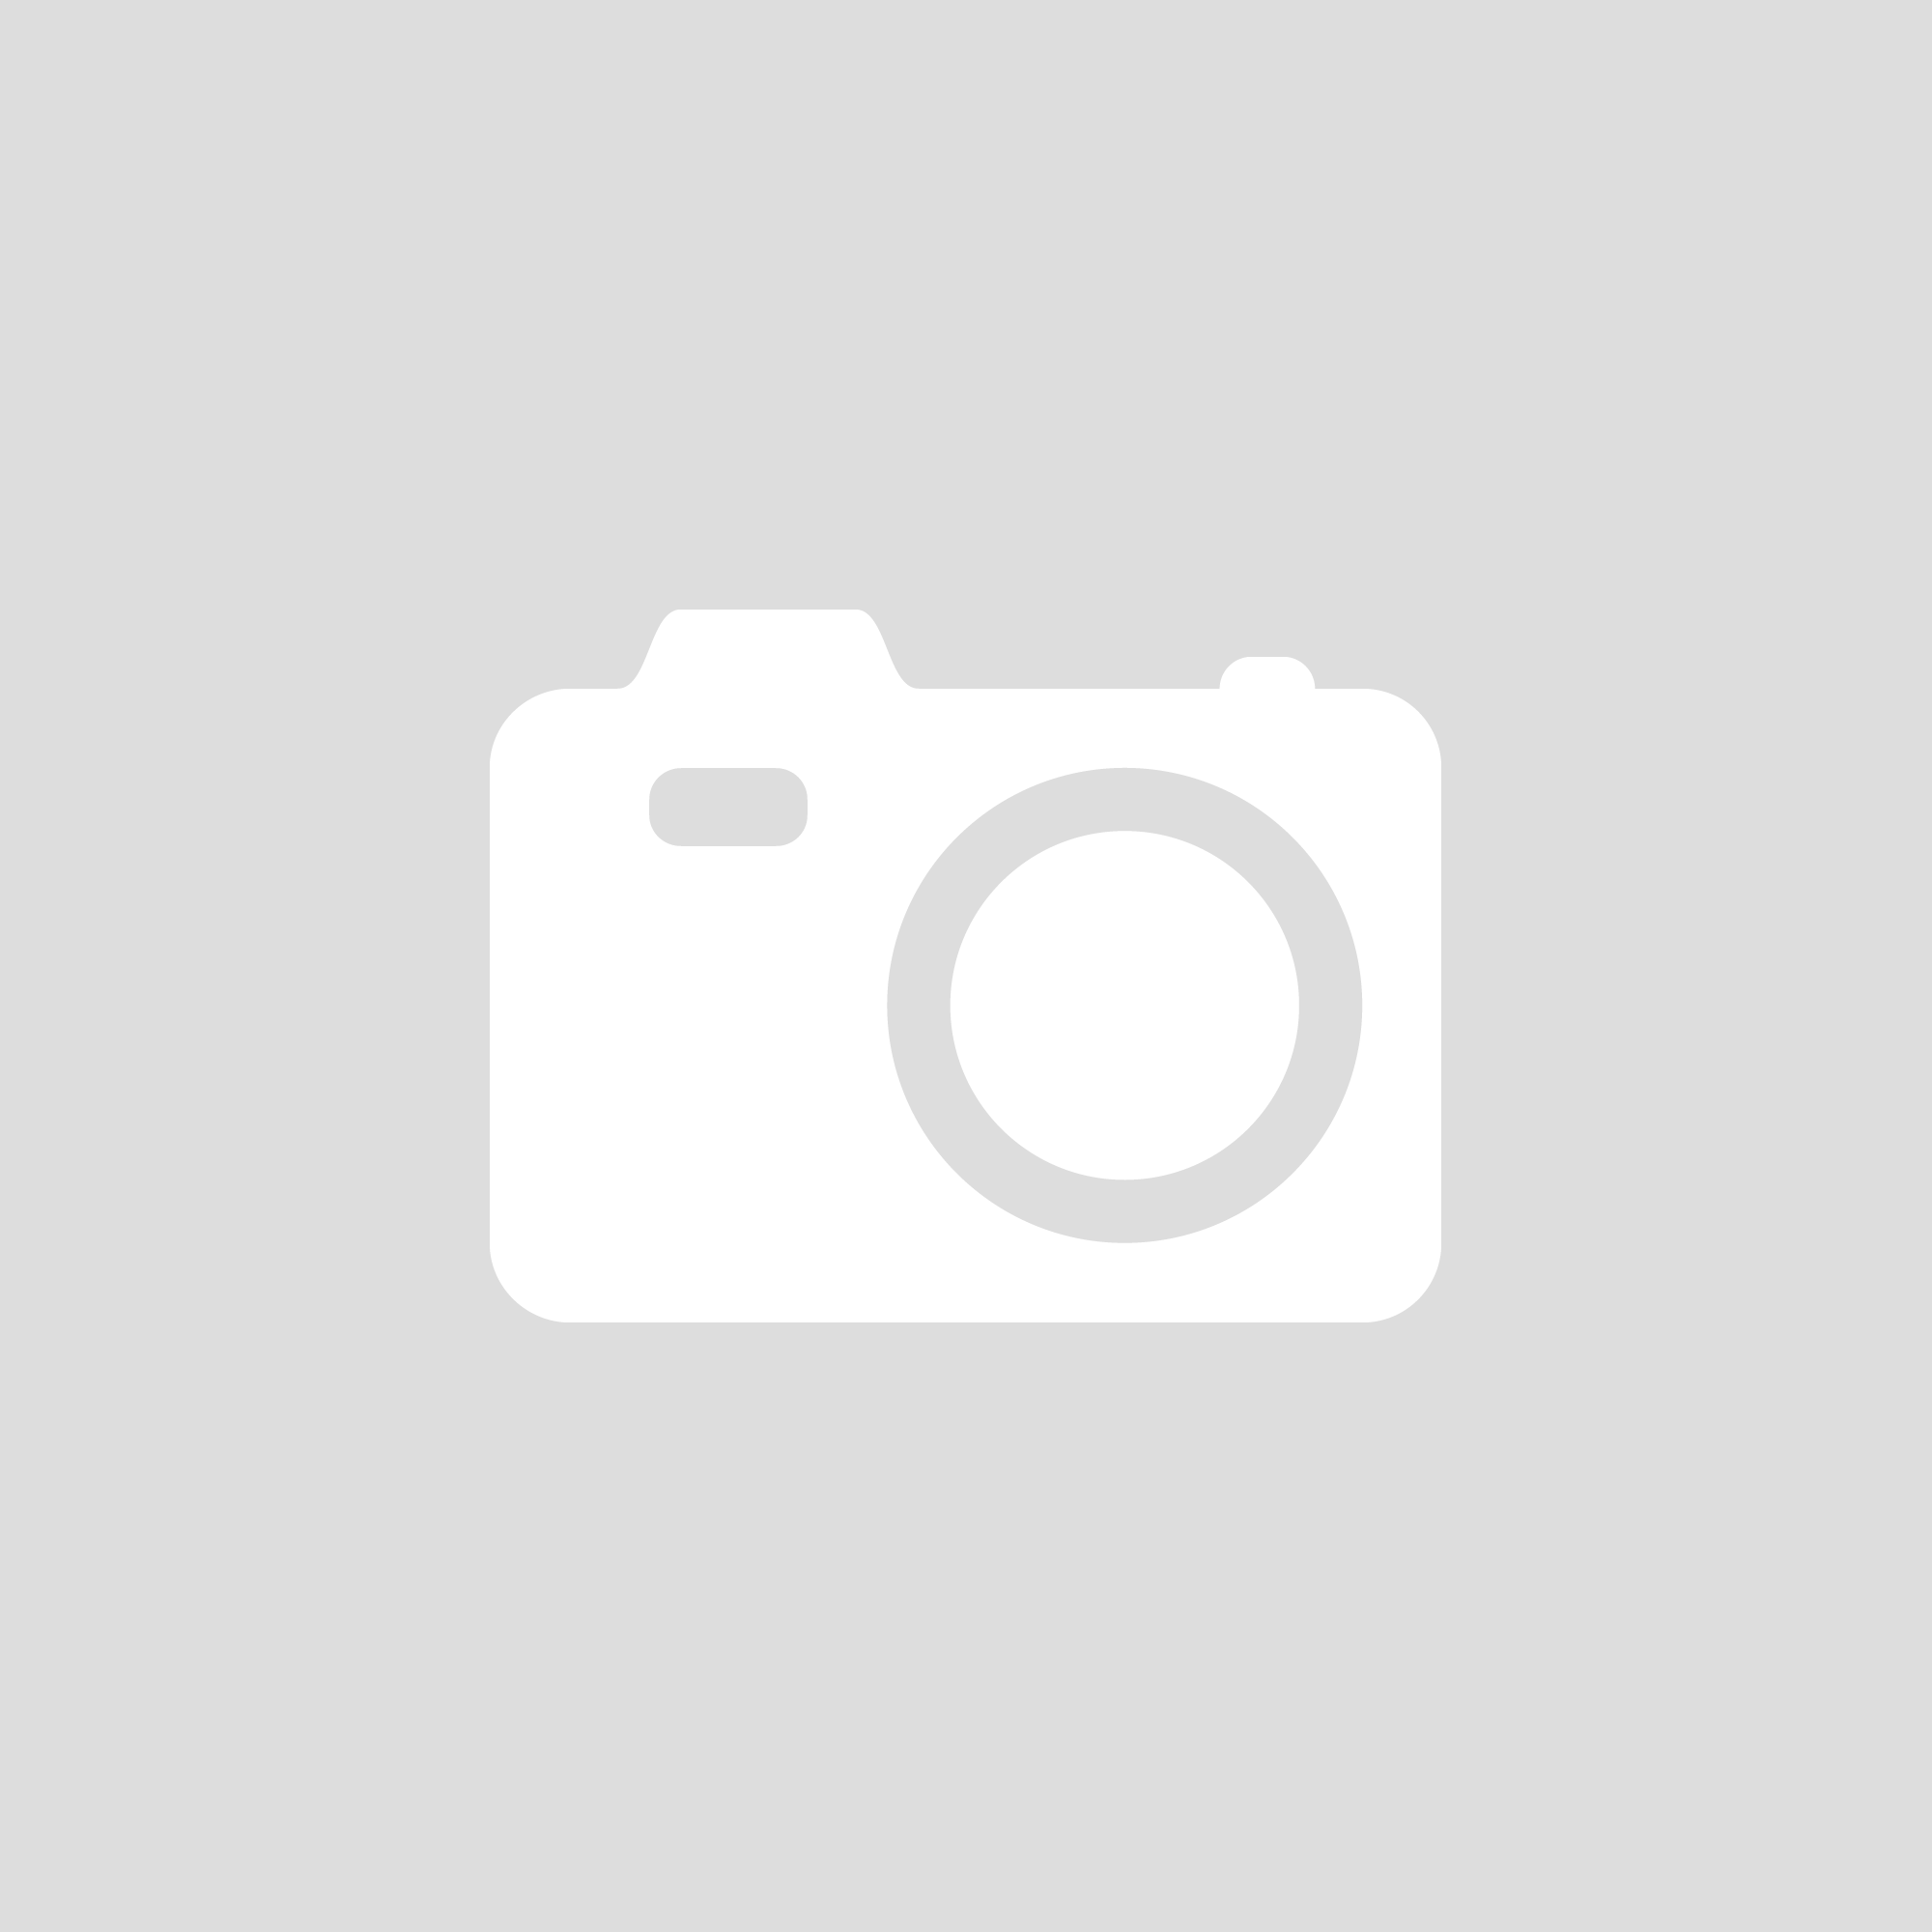 Glitz Glitter Cappucino / Creme Wallpaper by Graham & Brown 31-170